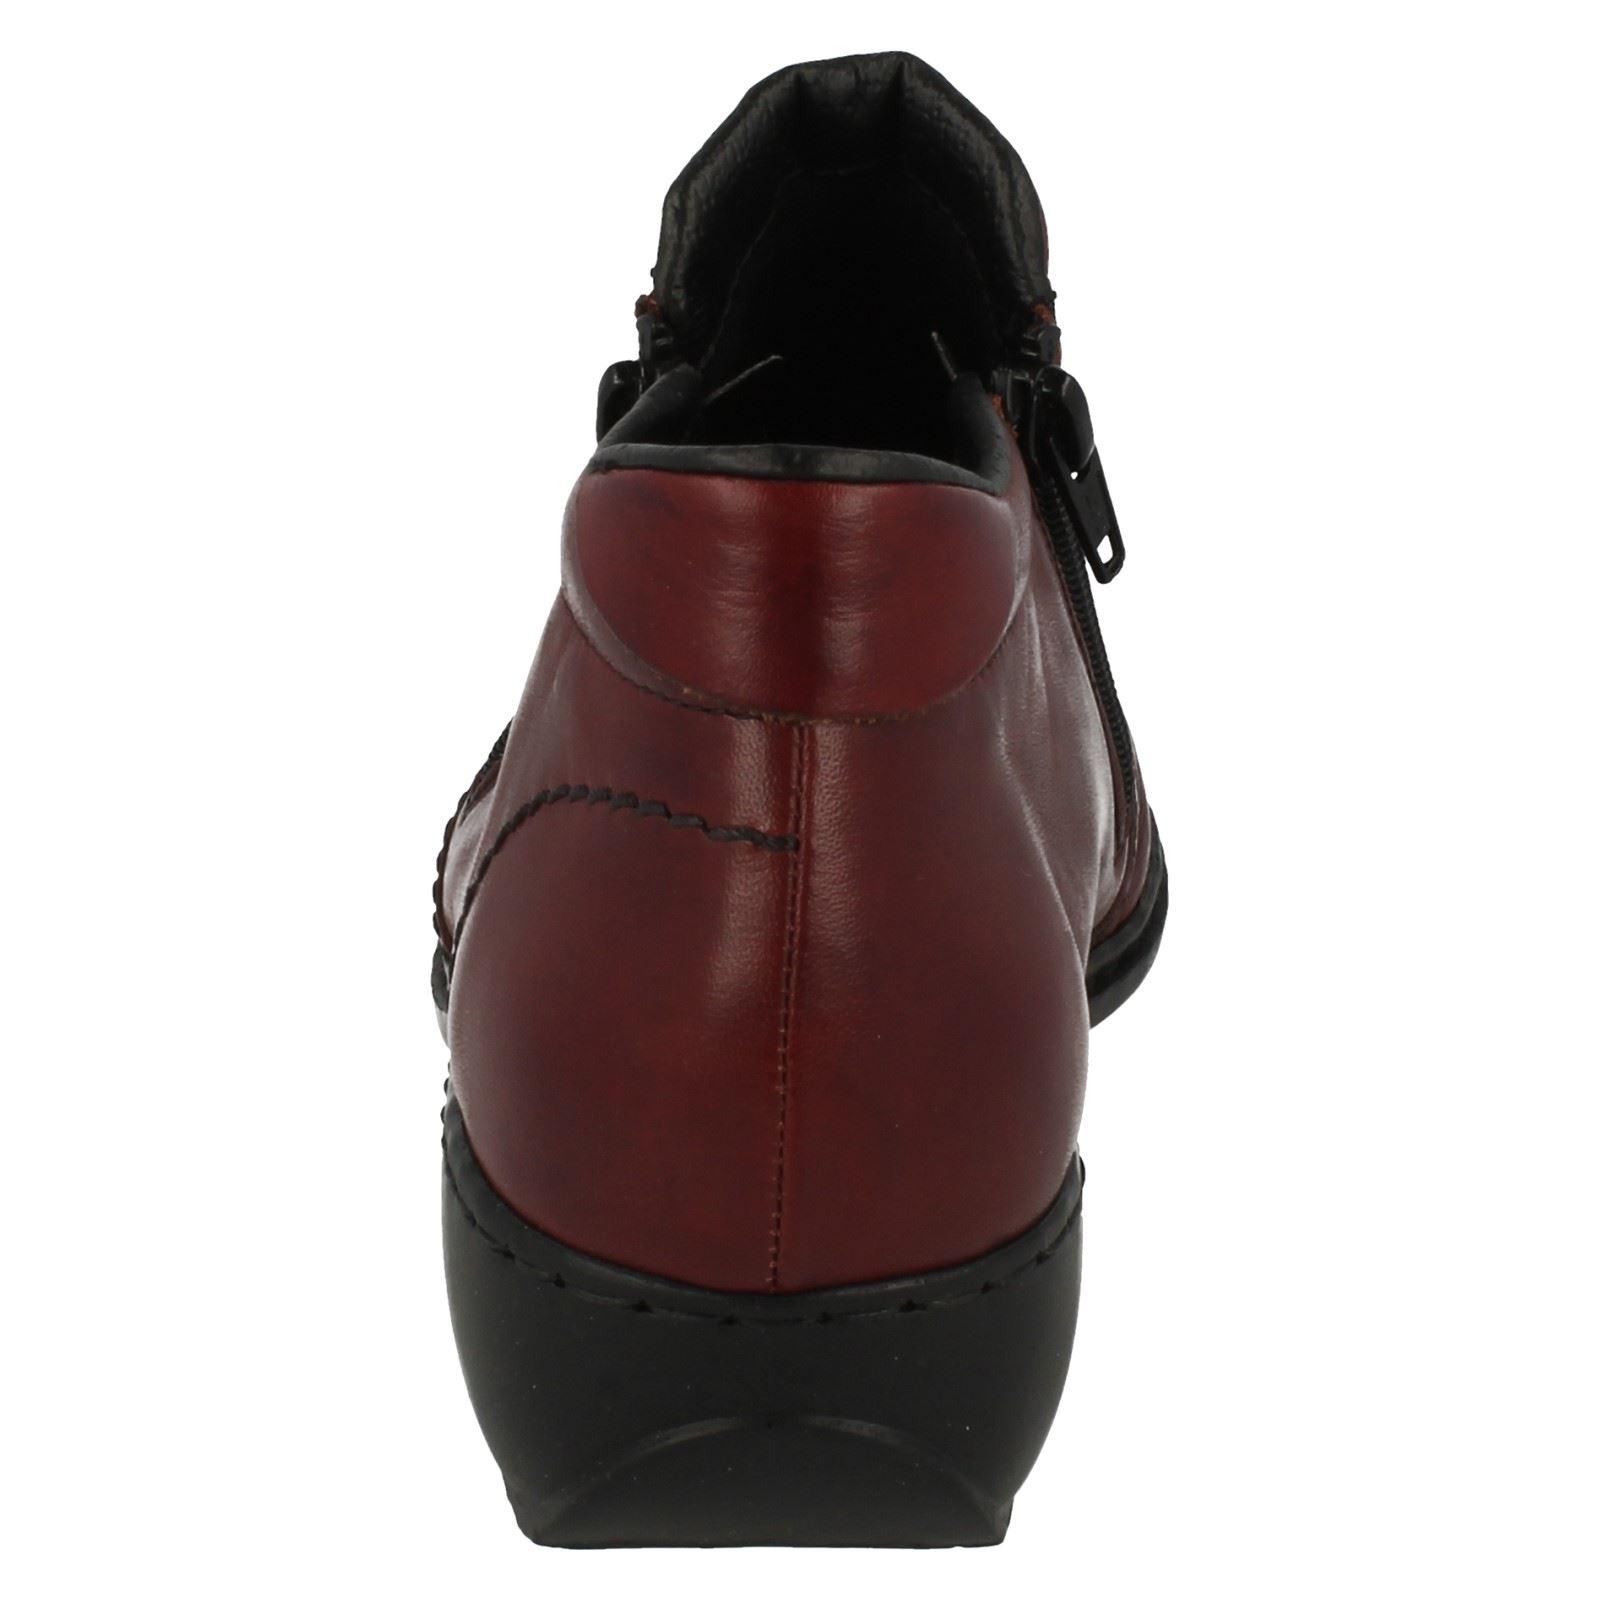 Ladies Rieker Stylish Antistress Ankle Boots L3892